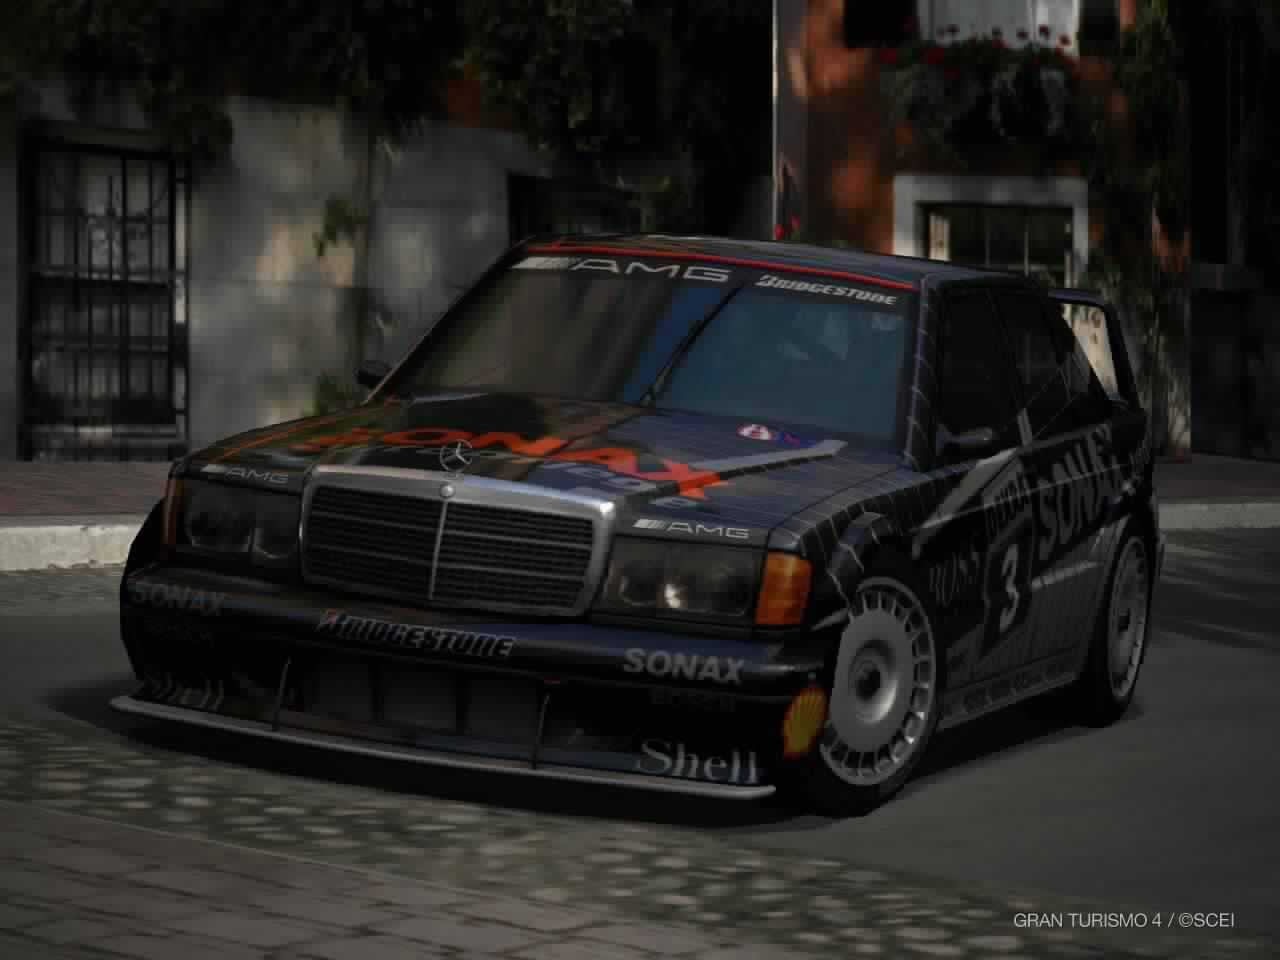 Mercedes-Benz 190 E 2 5 - 16 Evolution II Touring Car '92